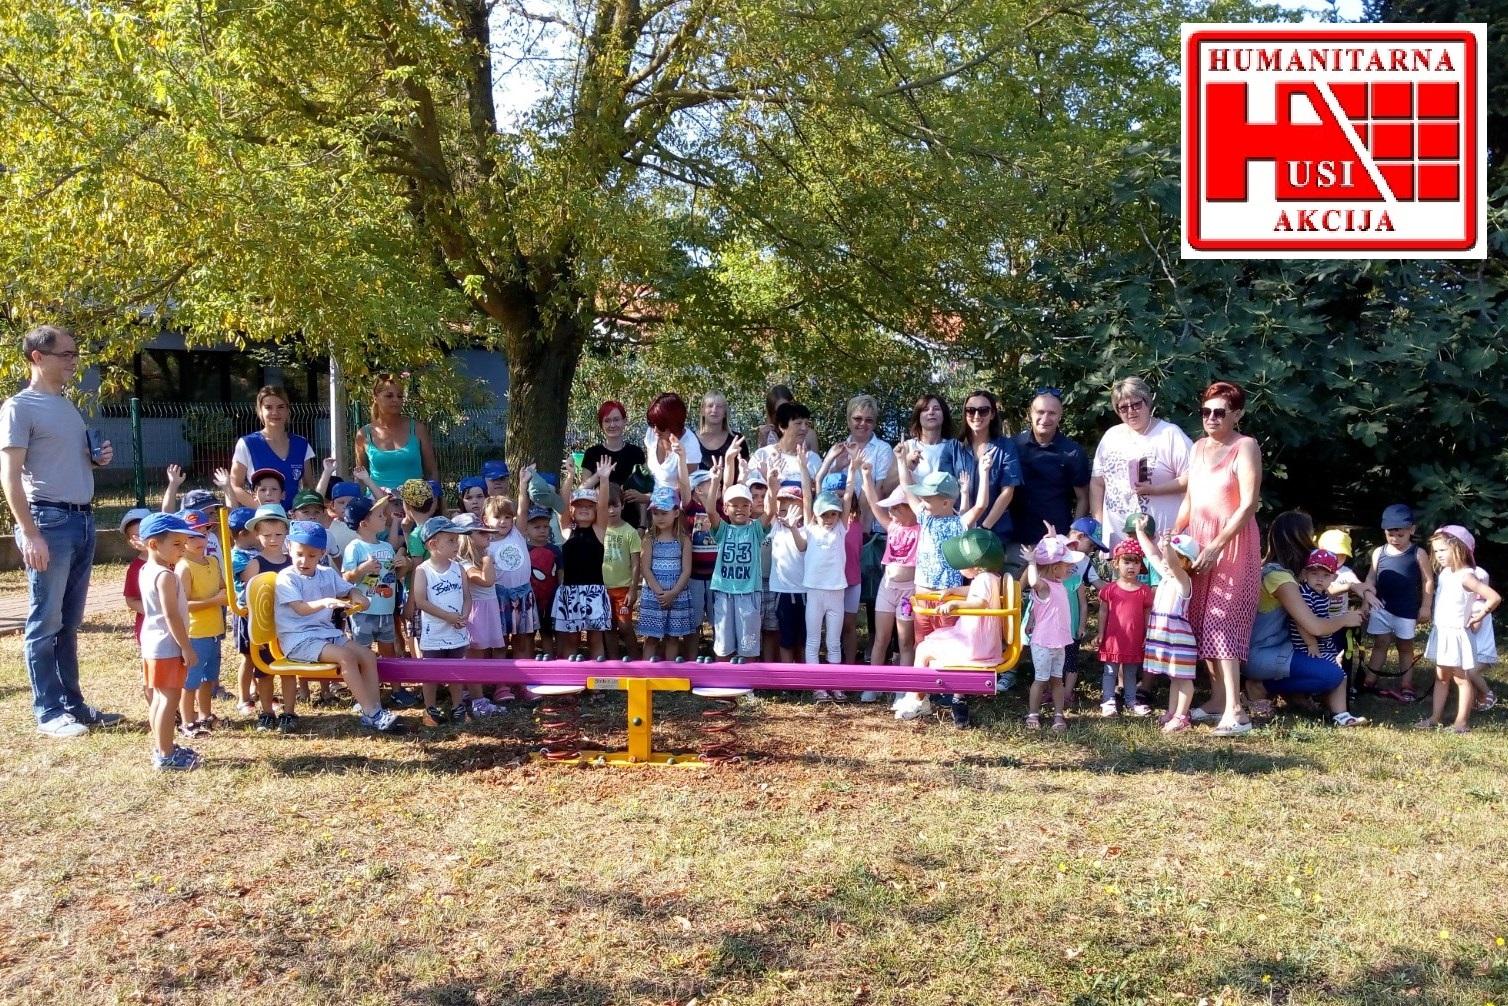 http://www.novigrad.hr/humanitarnom_akcijom_do_igrala_za_djecu_s_motorichkim_poteshkoama